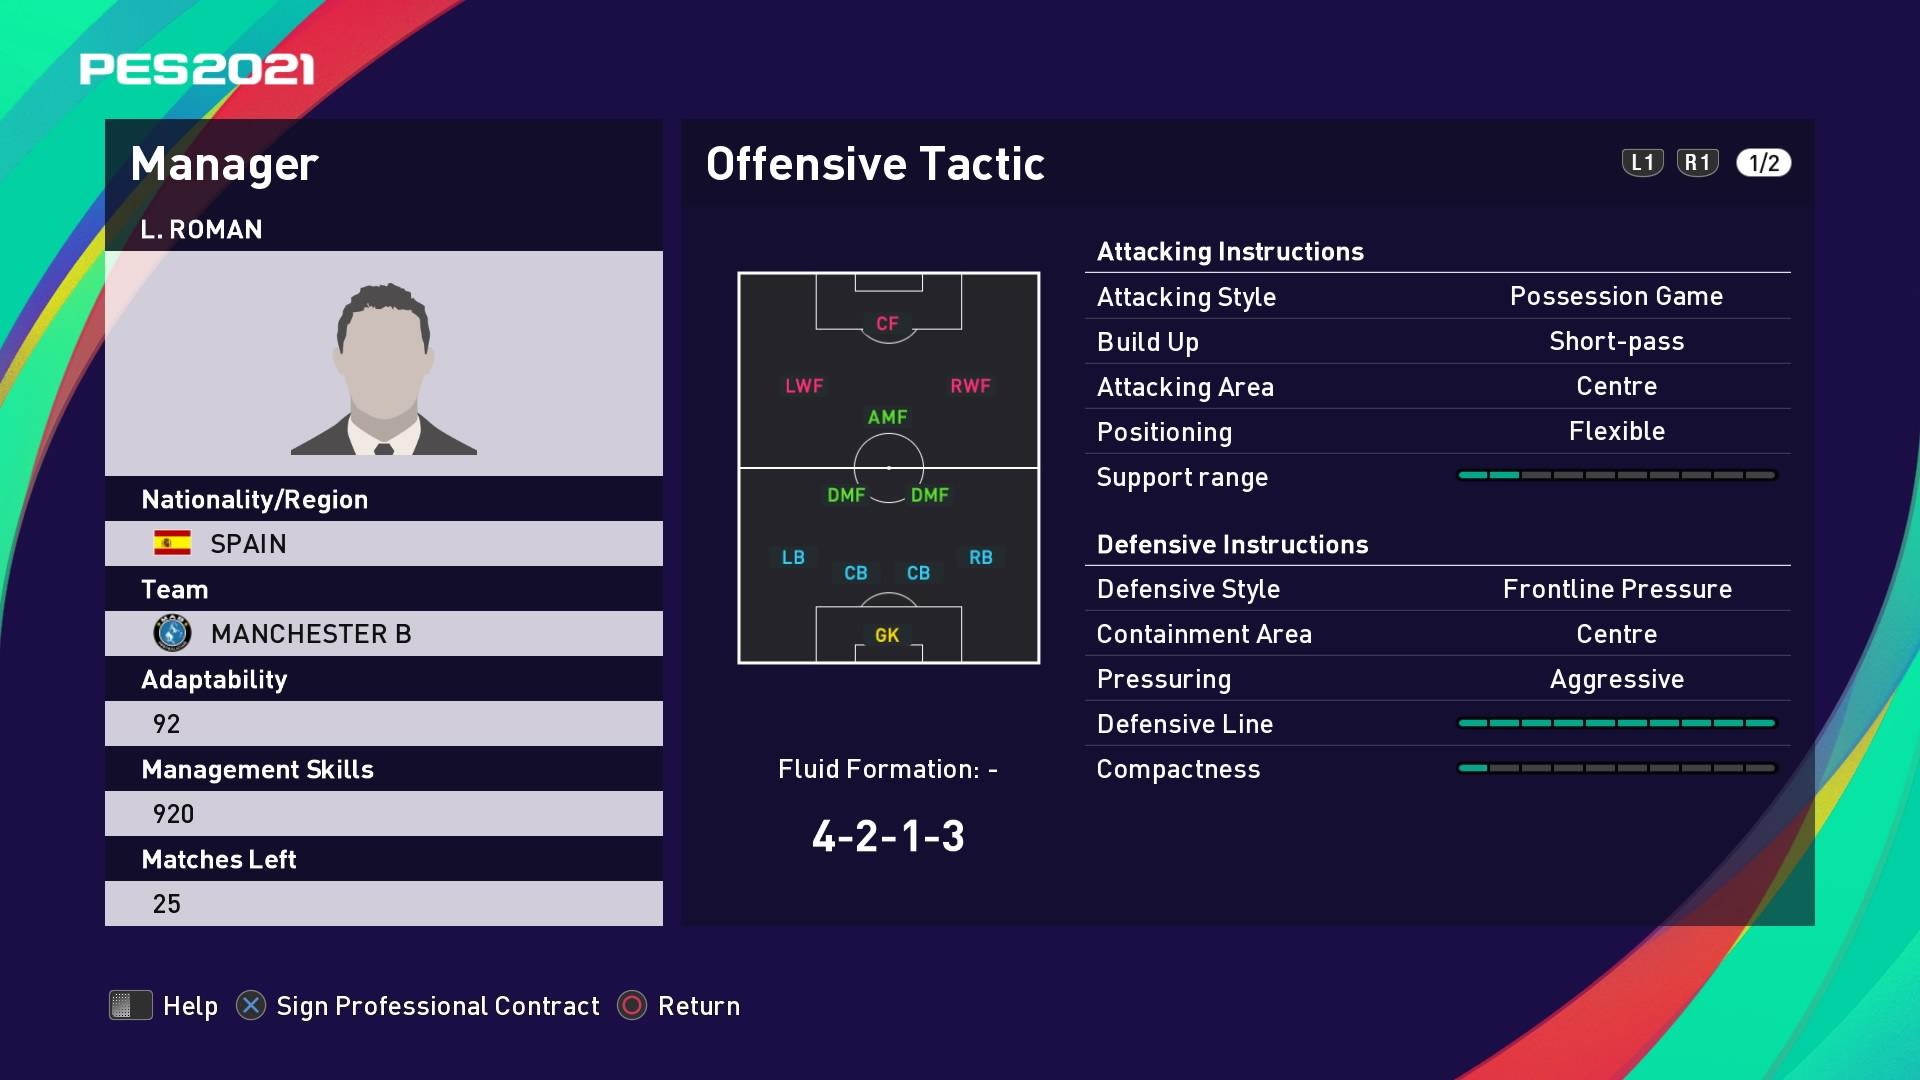 L. Roman (Pep Guardiola) Offensive Tactic in PES 2021 myClub